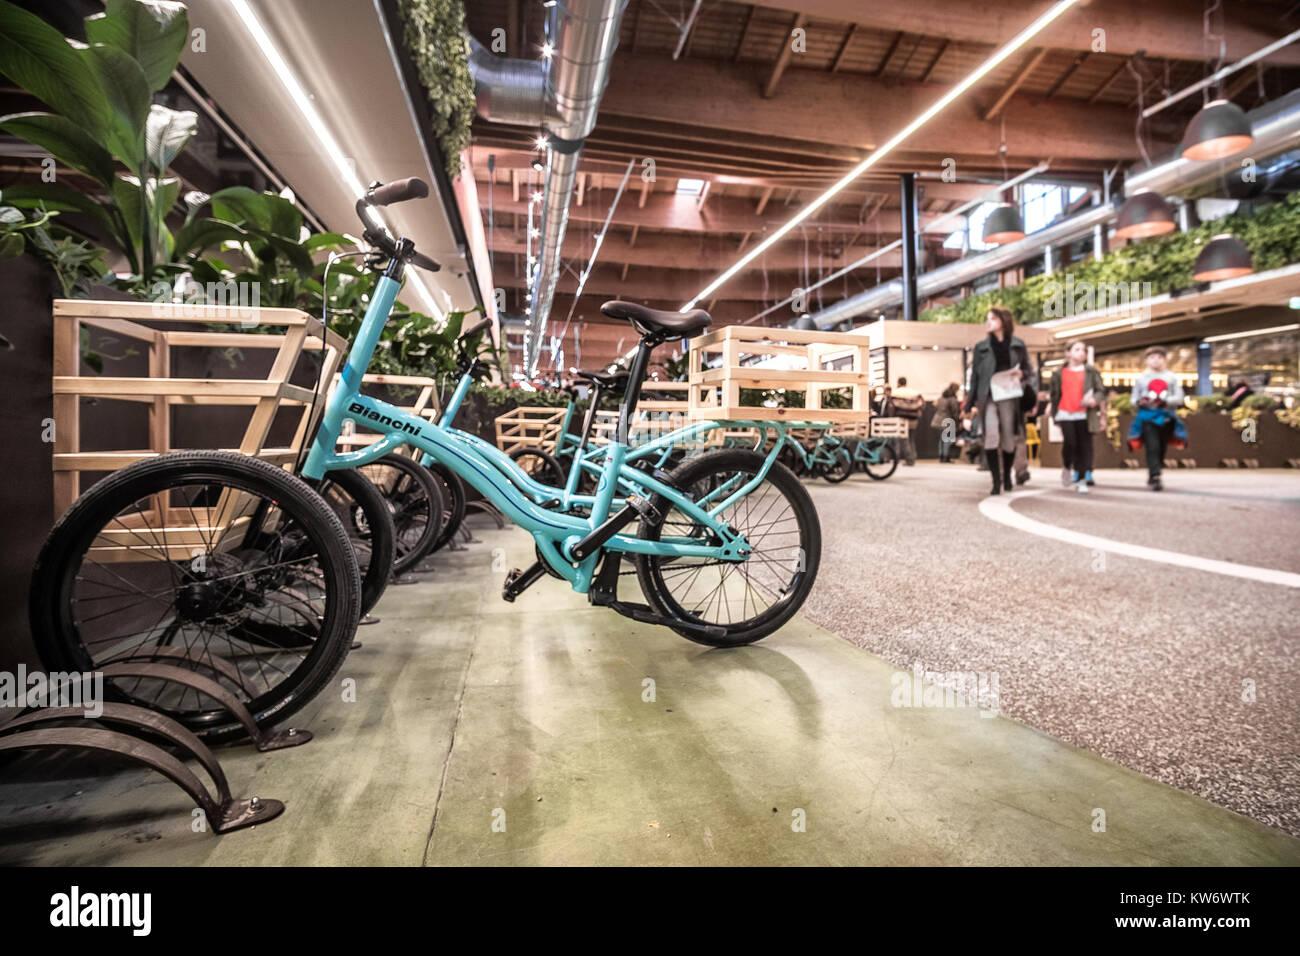 Fahrräder Shopping Carts Moderne Italienische Küche Superstore Fico Eataly  Welt Bologna